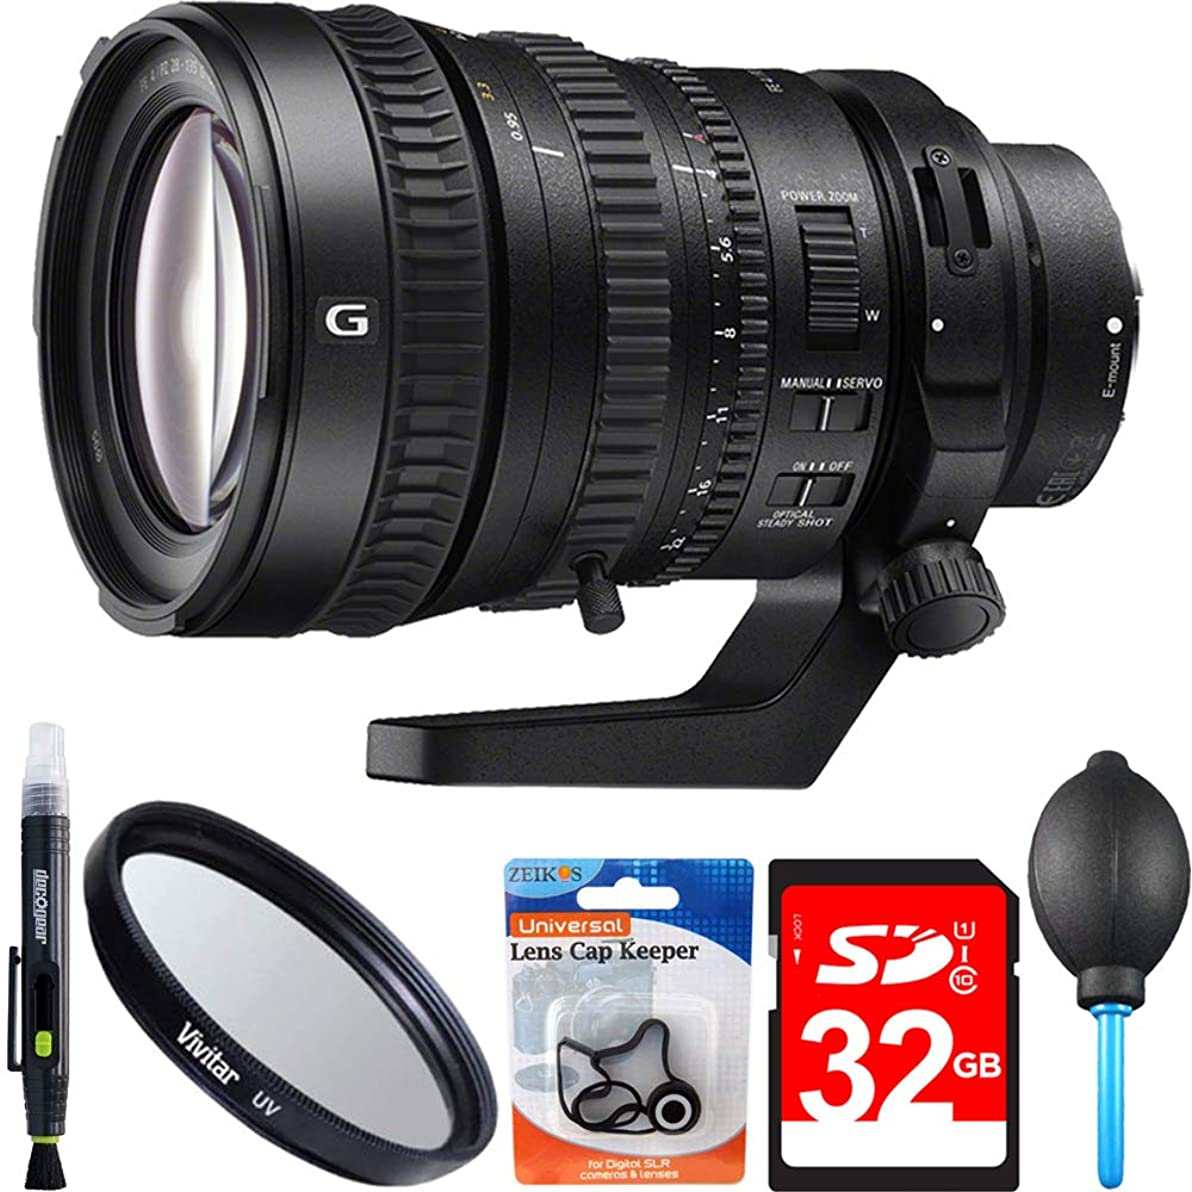 Sony SELP28135G 28-135mm Full-frame E-mount Power Zoom Lens Accessory Bundle Includes 28-135mm Full-frame E-mount Power Zoom Lens, 95mm UV Filter, 32GB SDHC High Speed Memory Card & More